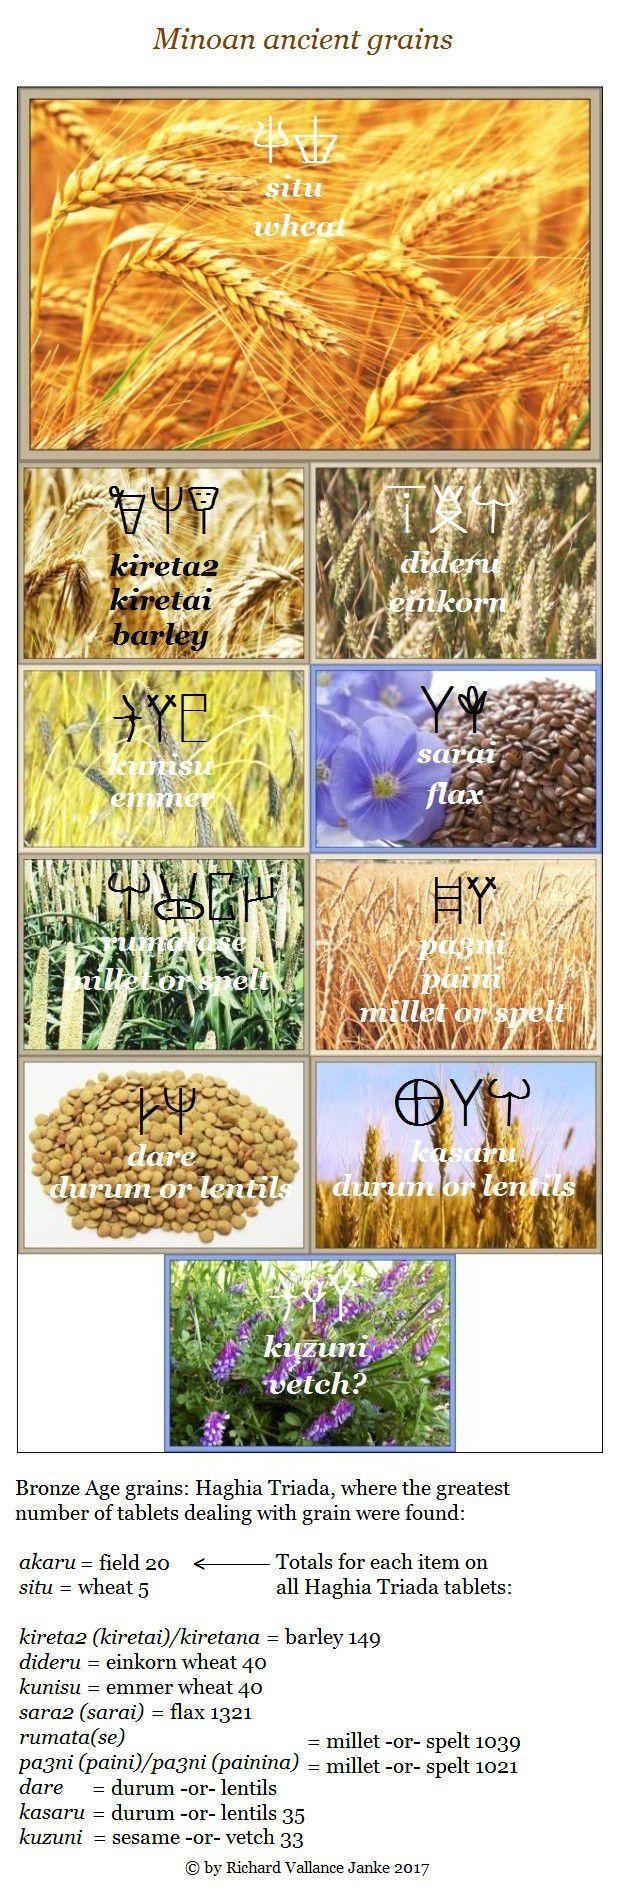 Minoan ancient grains